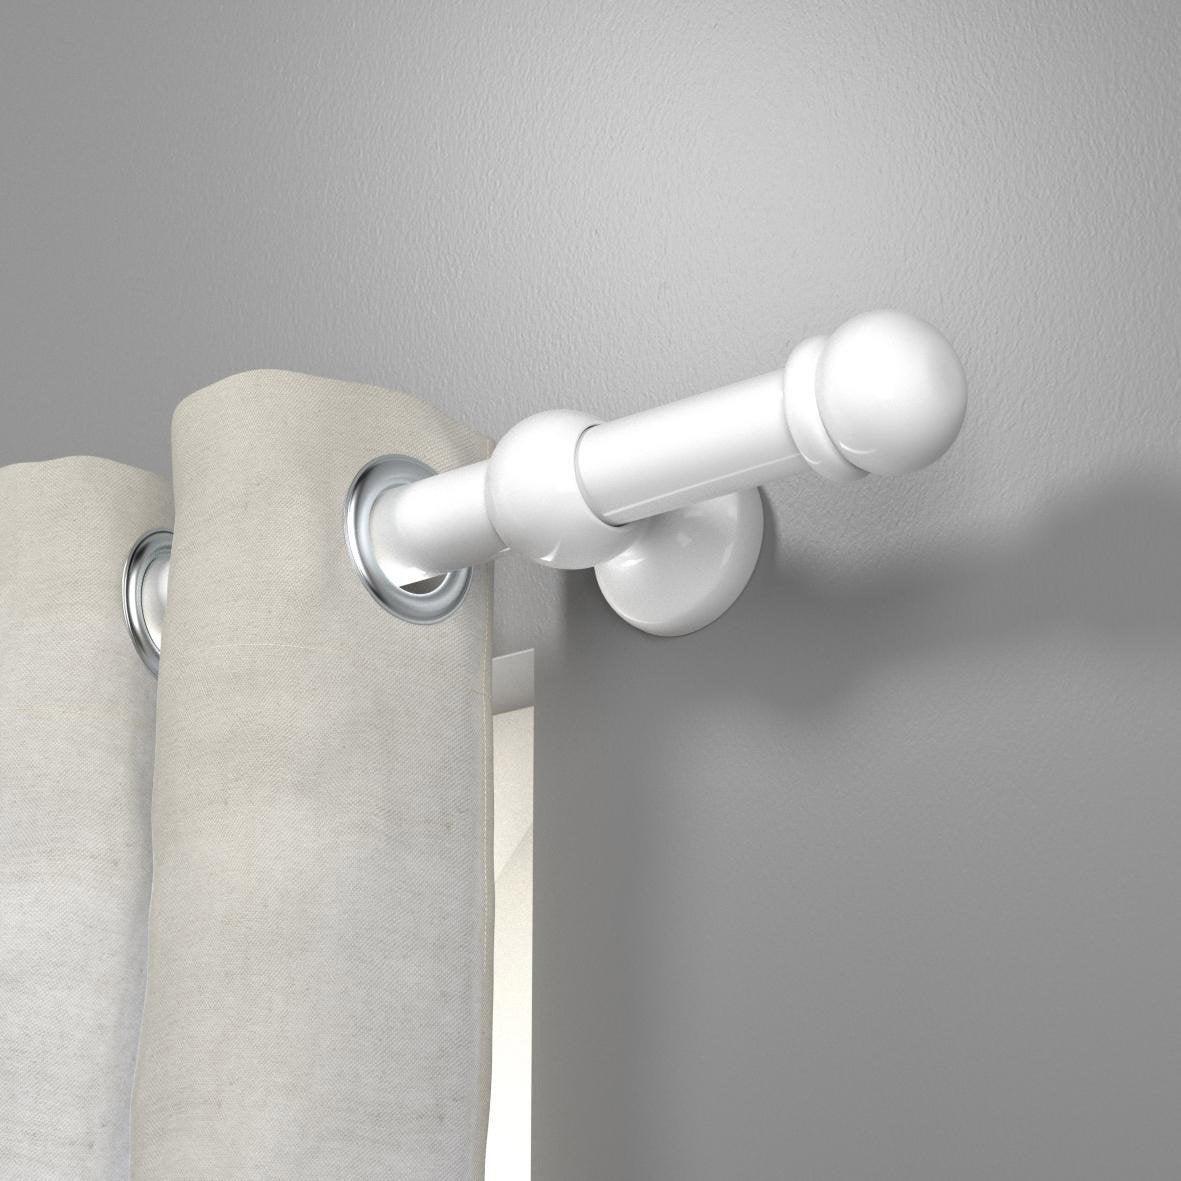 Lance rideaux tringle rideau 28 mm bois blanc inspire leroy merlin - Tringles rideaux sans percage leroy merlin ...